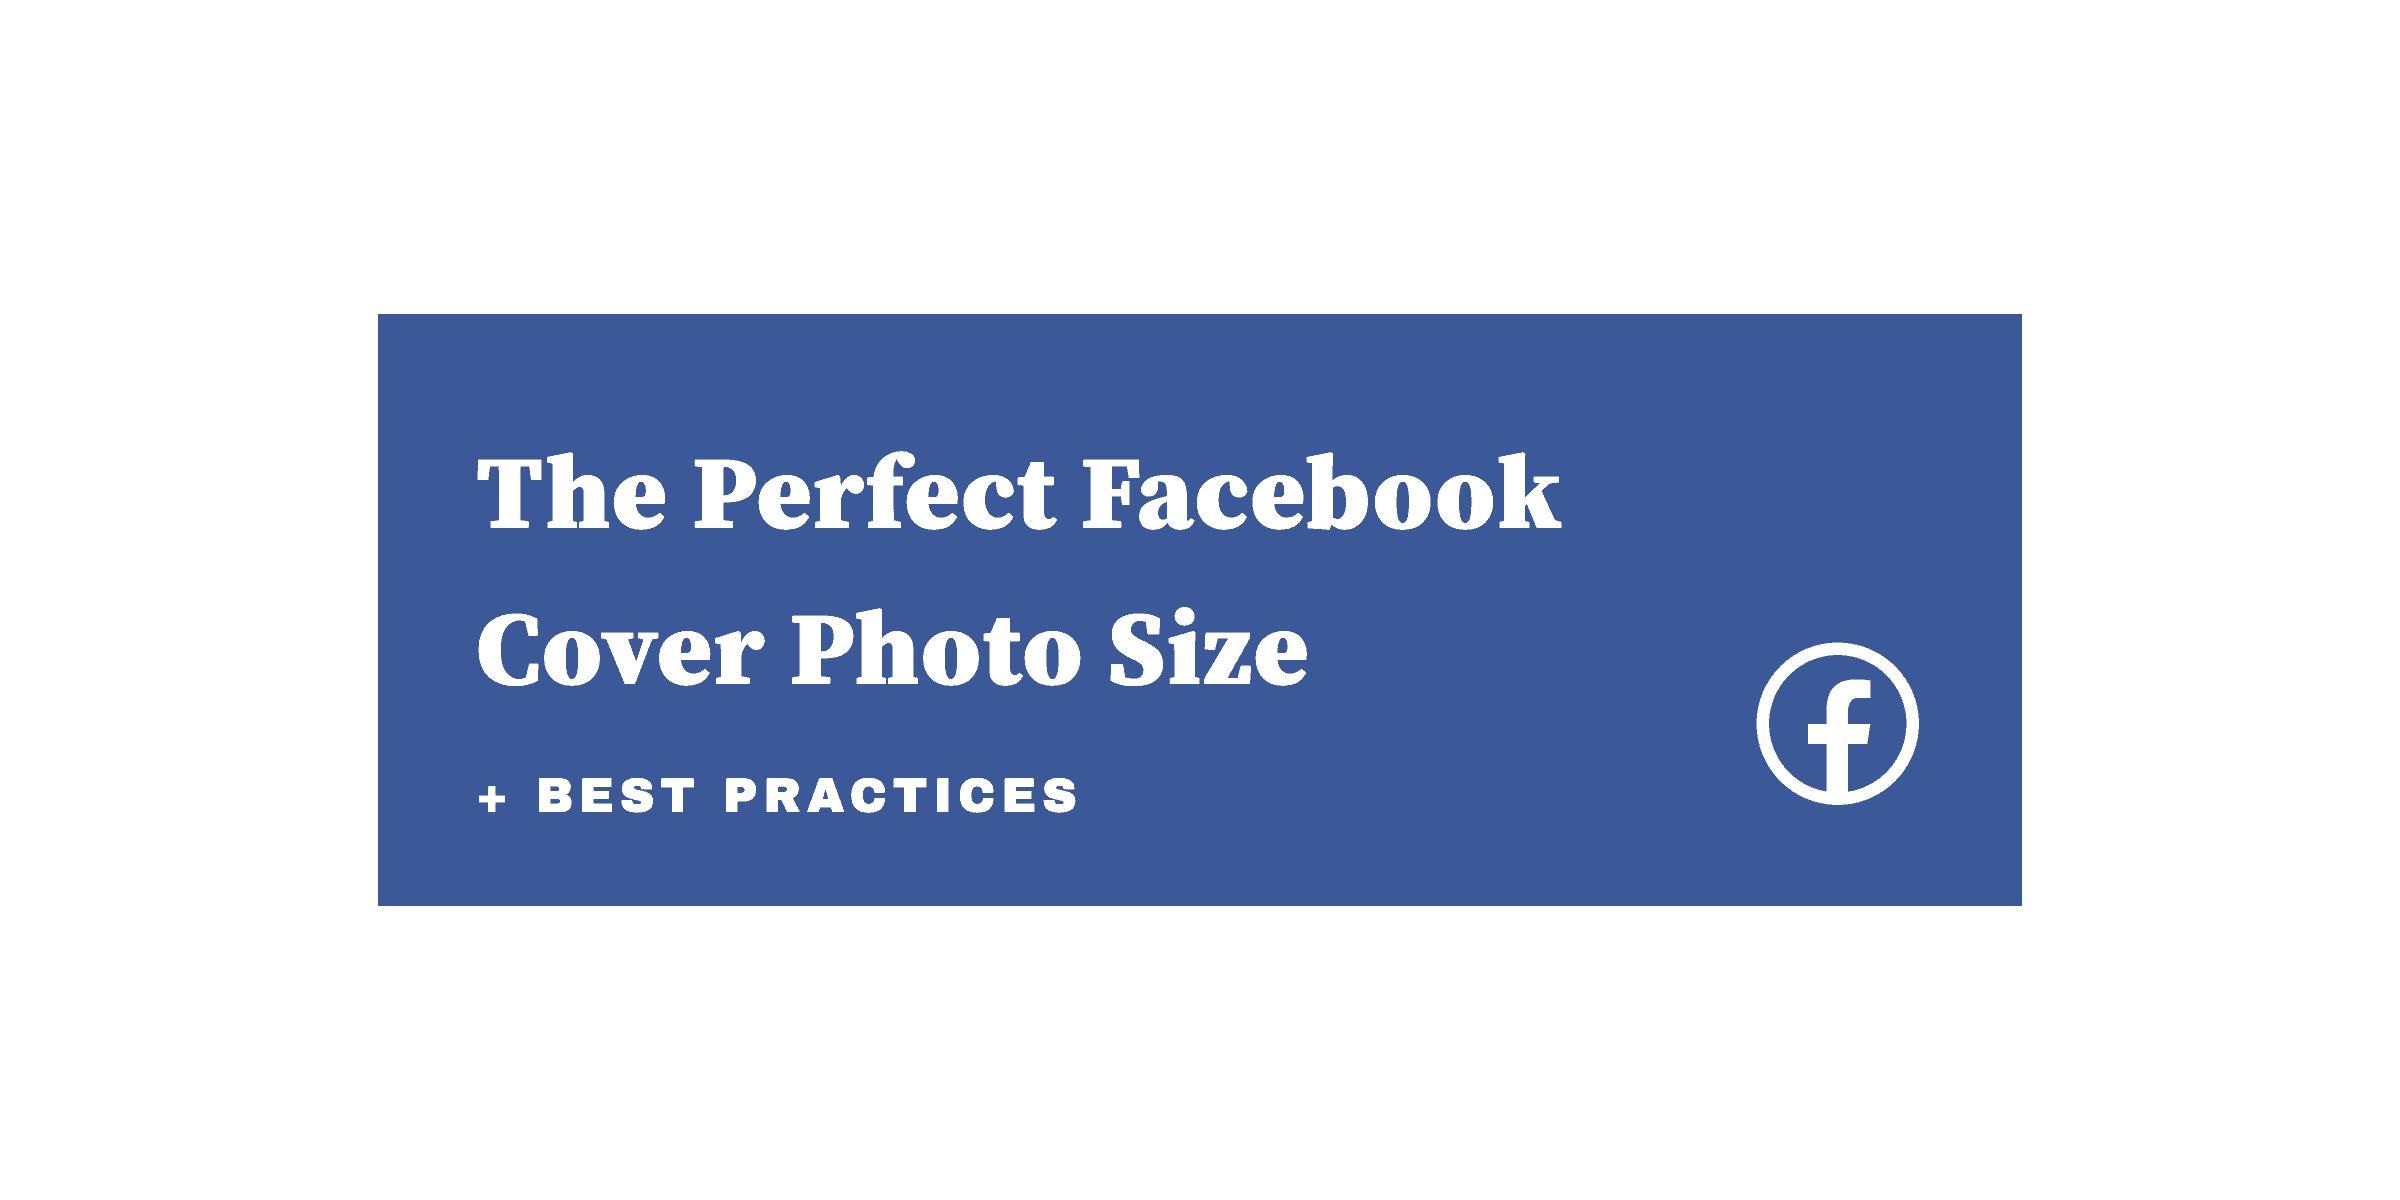 Facebook cover photo size